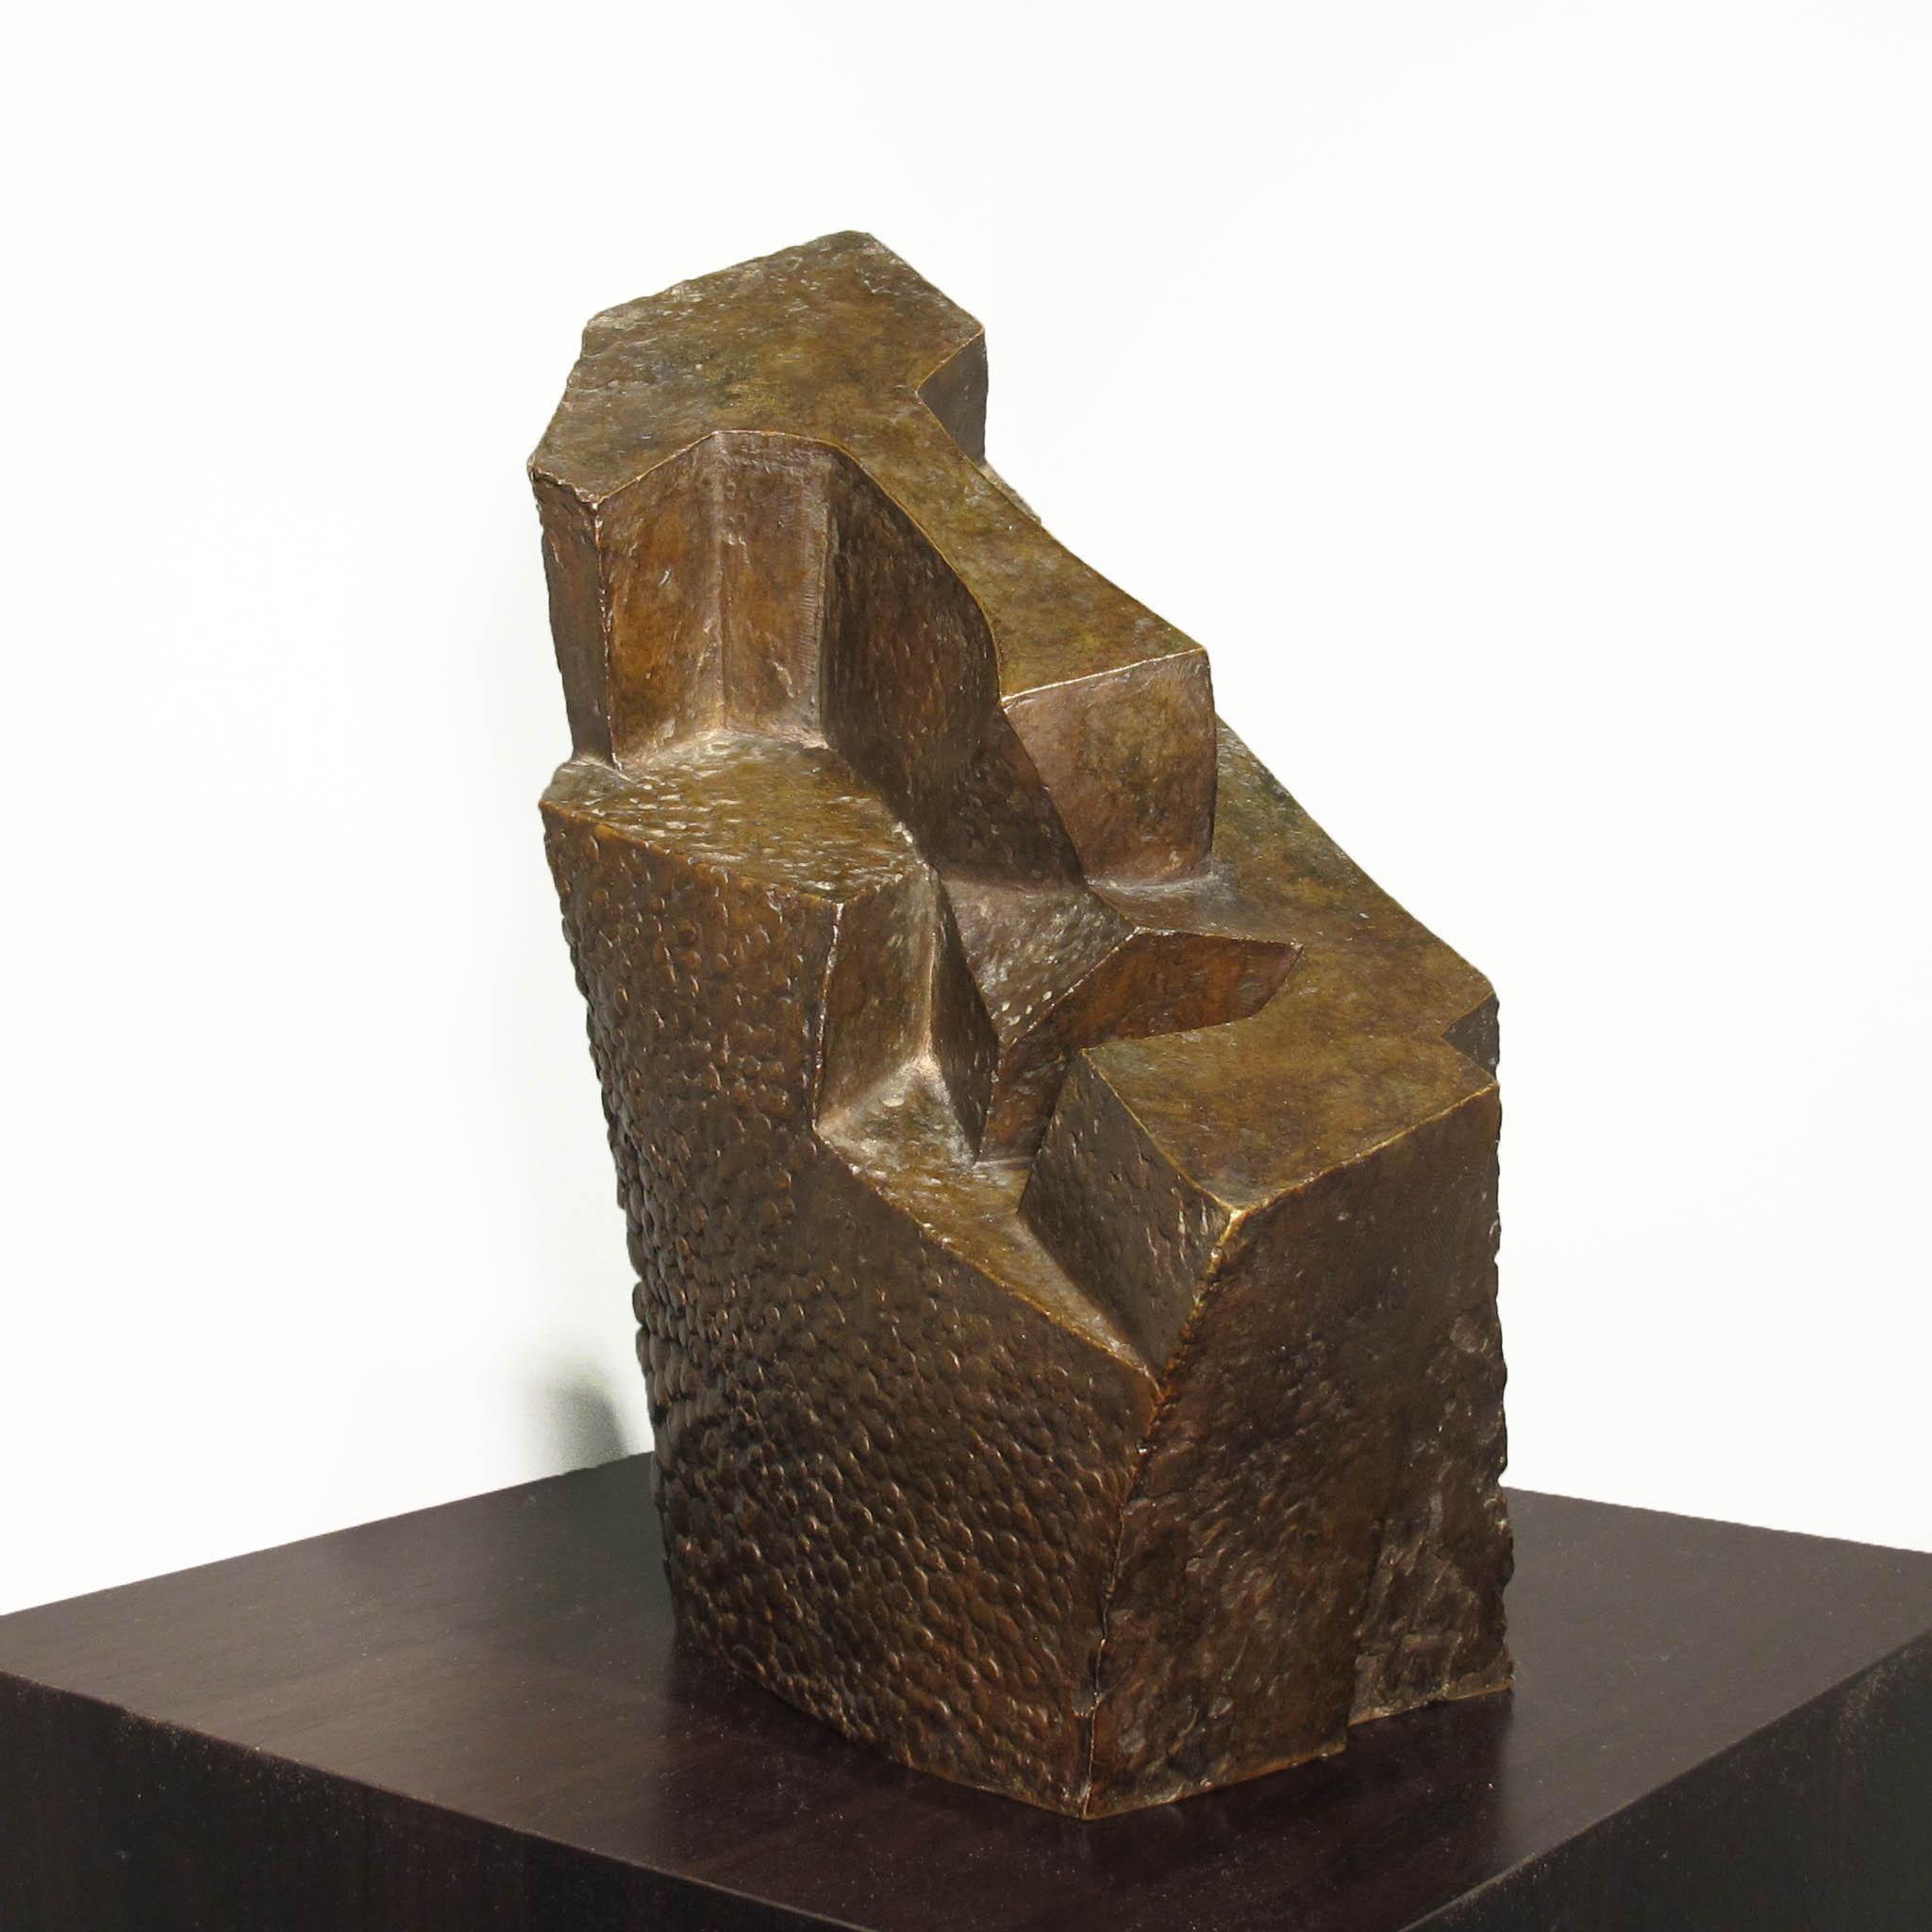 Untitled: Cubist Head